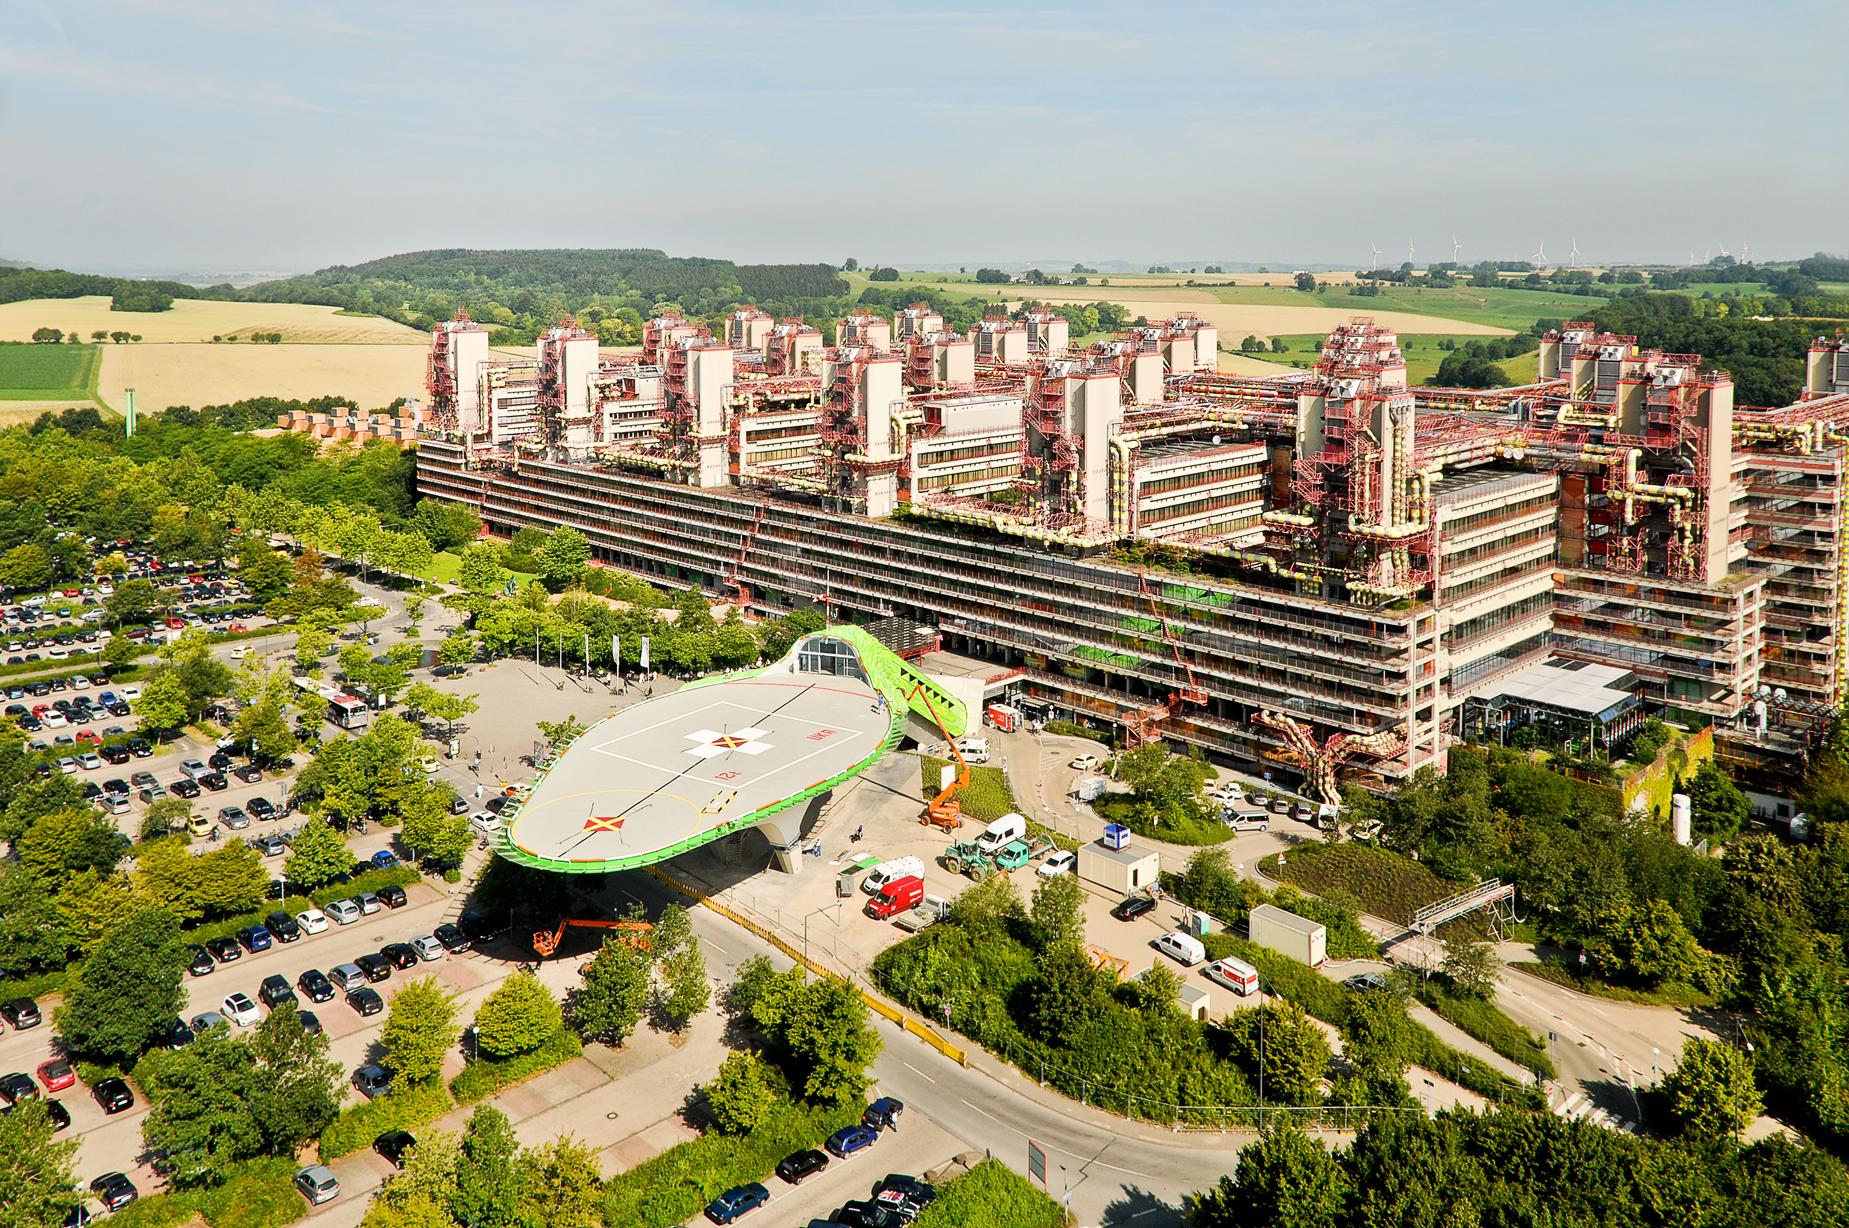 University hospital RWTH Aachen